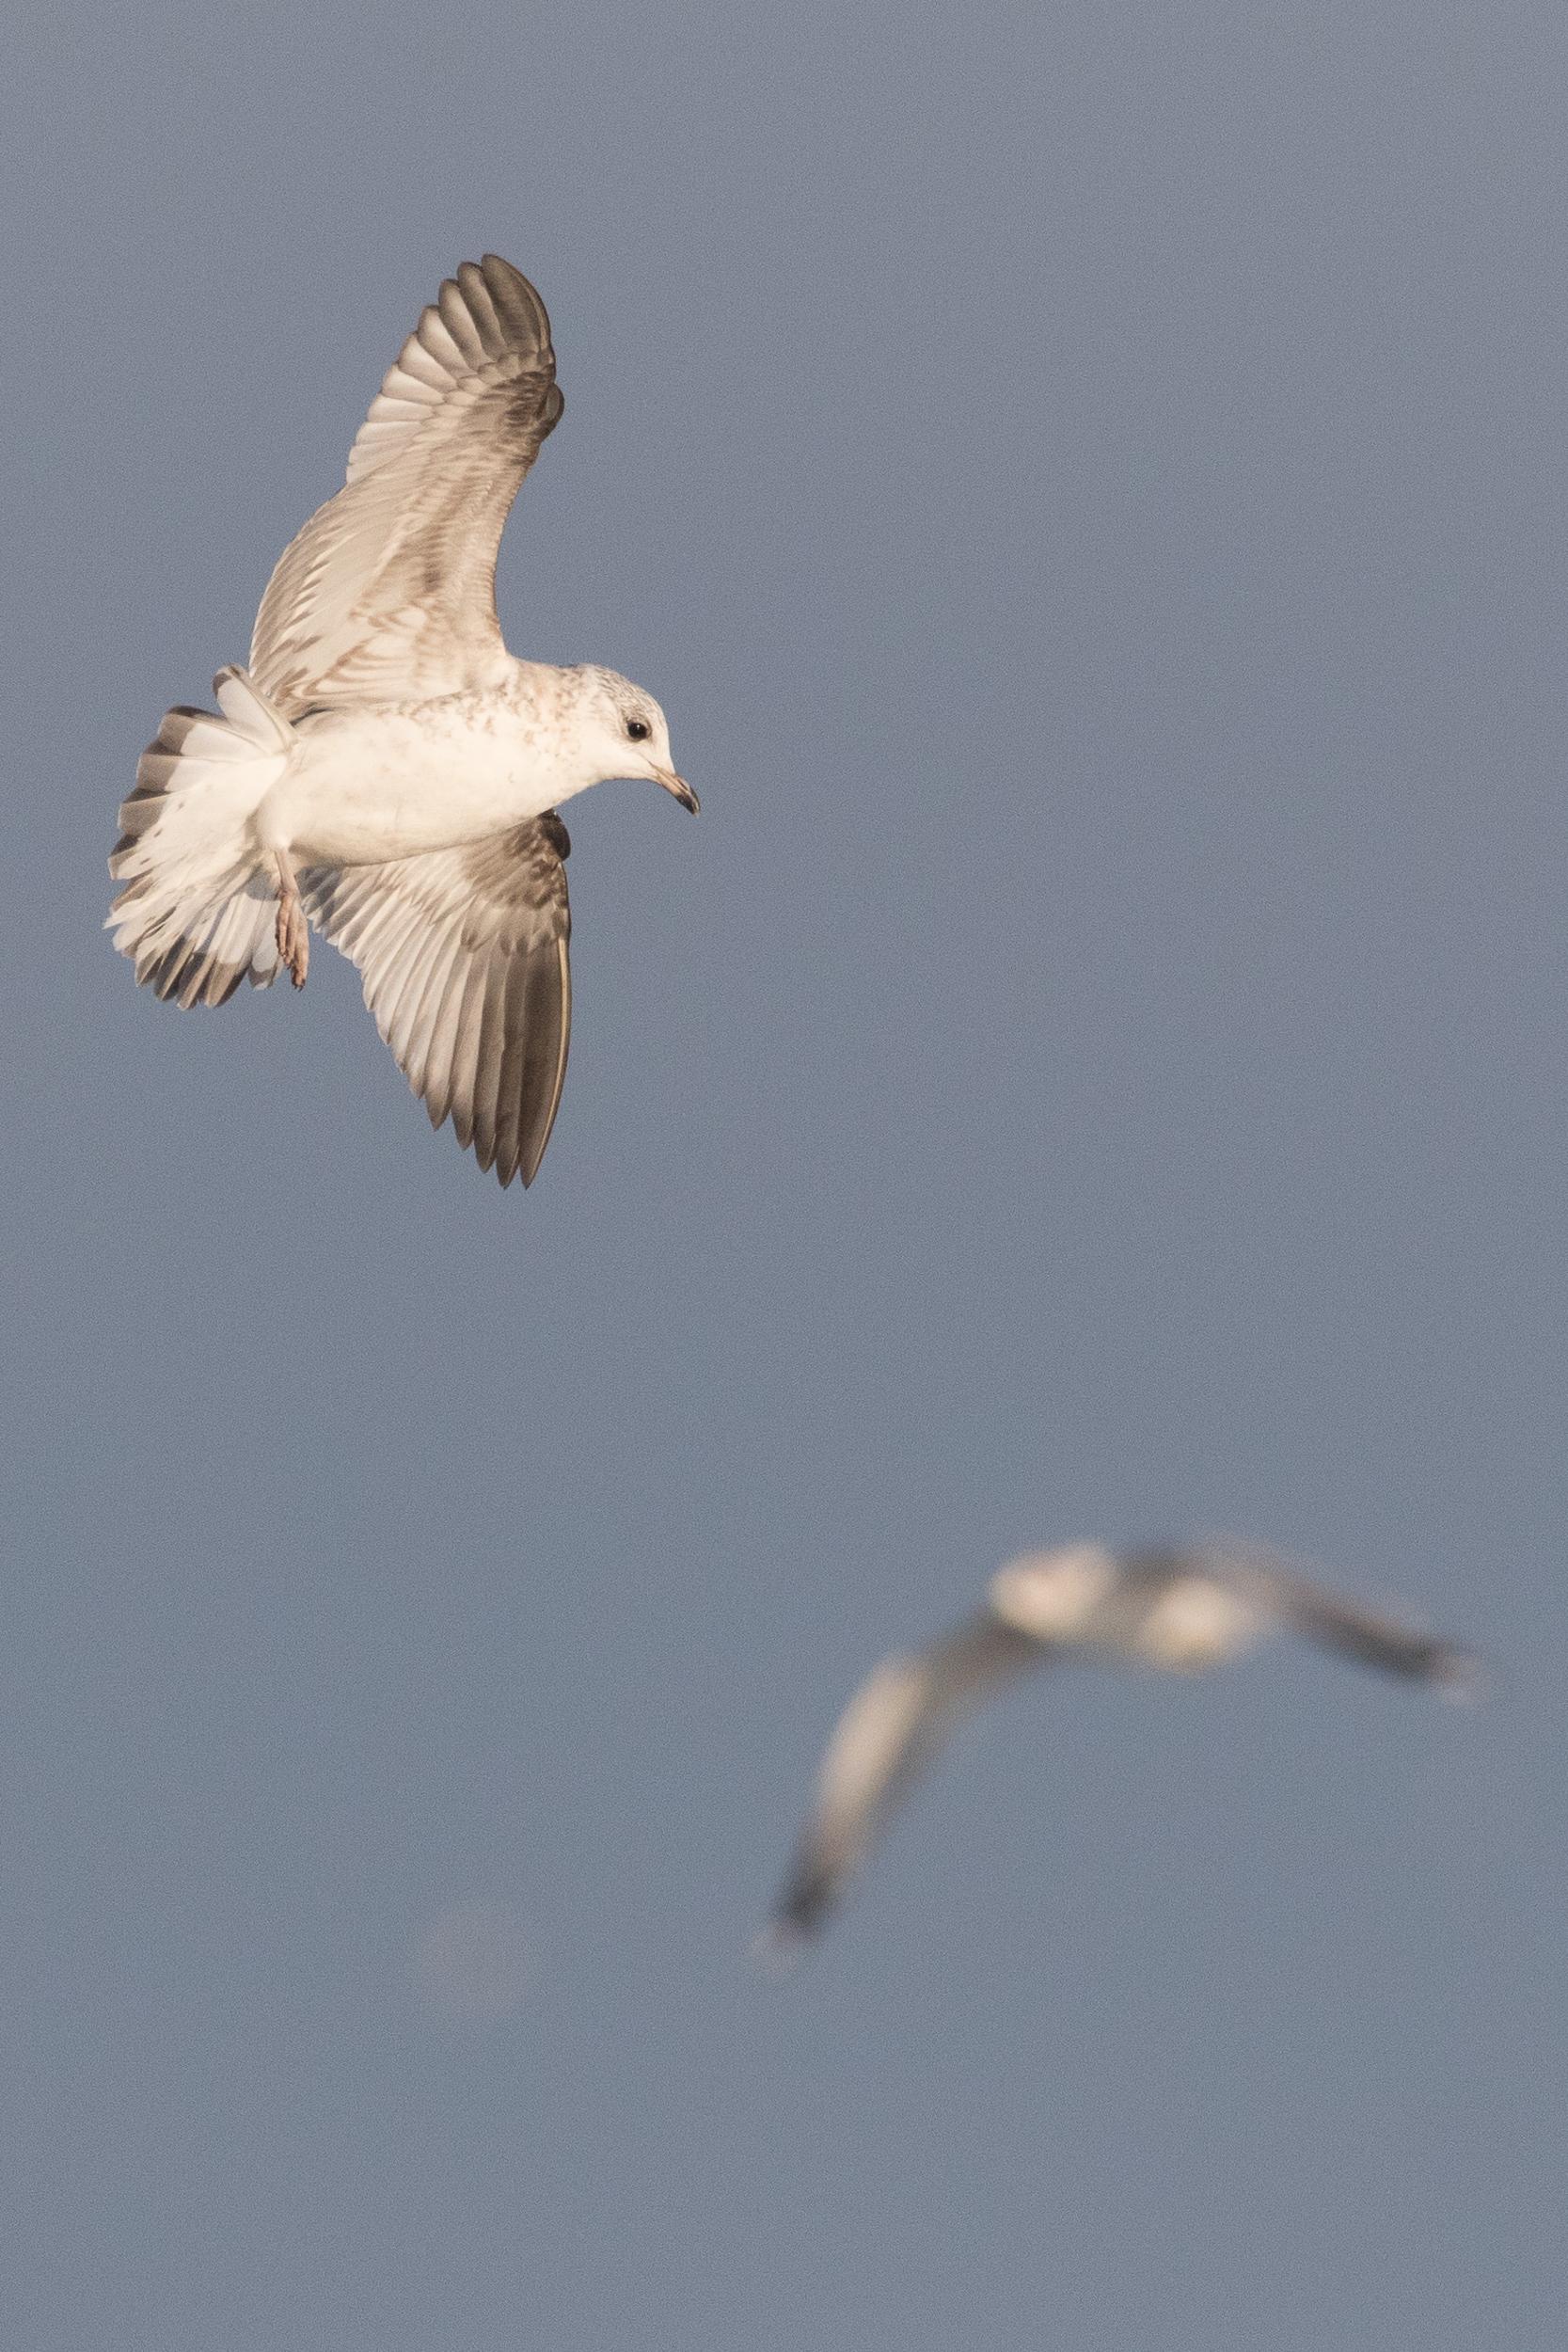 20170121-Common Gull 2CY-01.jpg